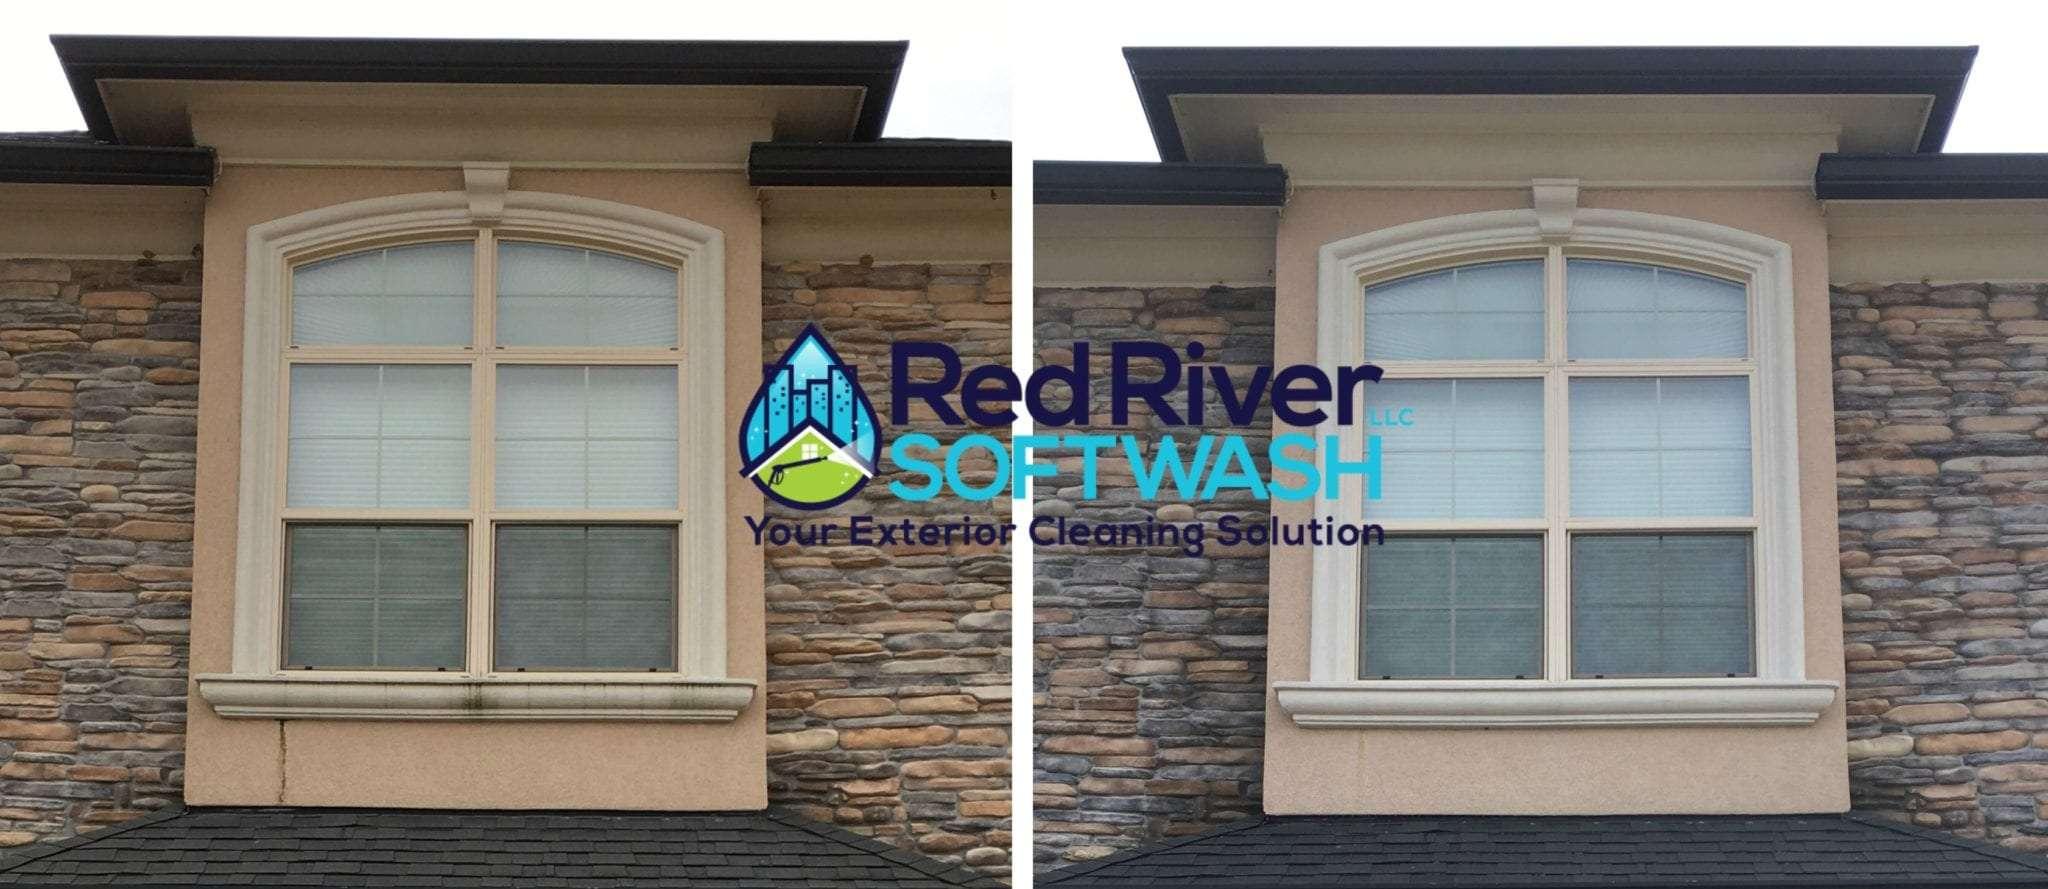 Texarkana TX Roof Cleaning Pressure Washing